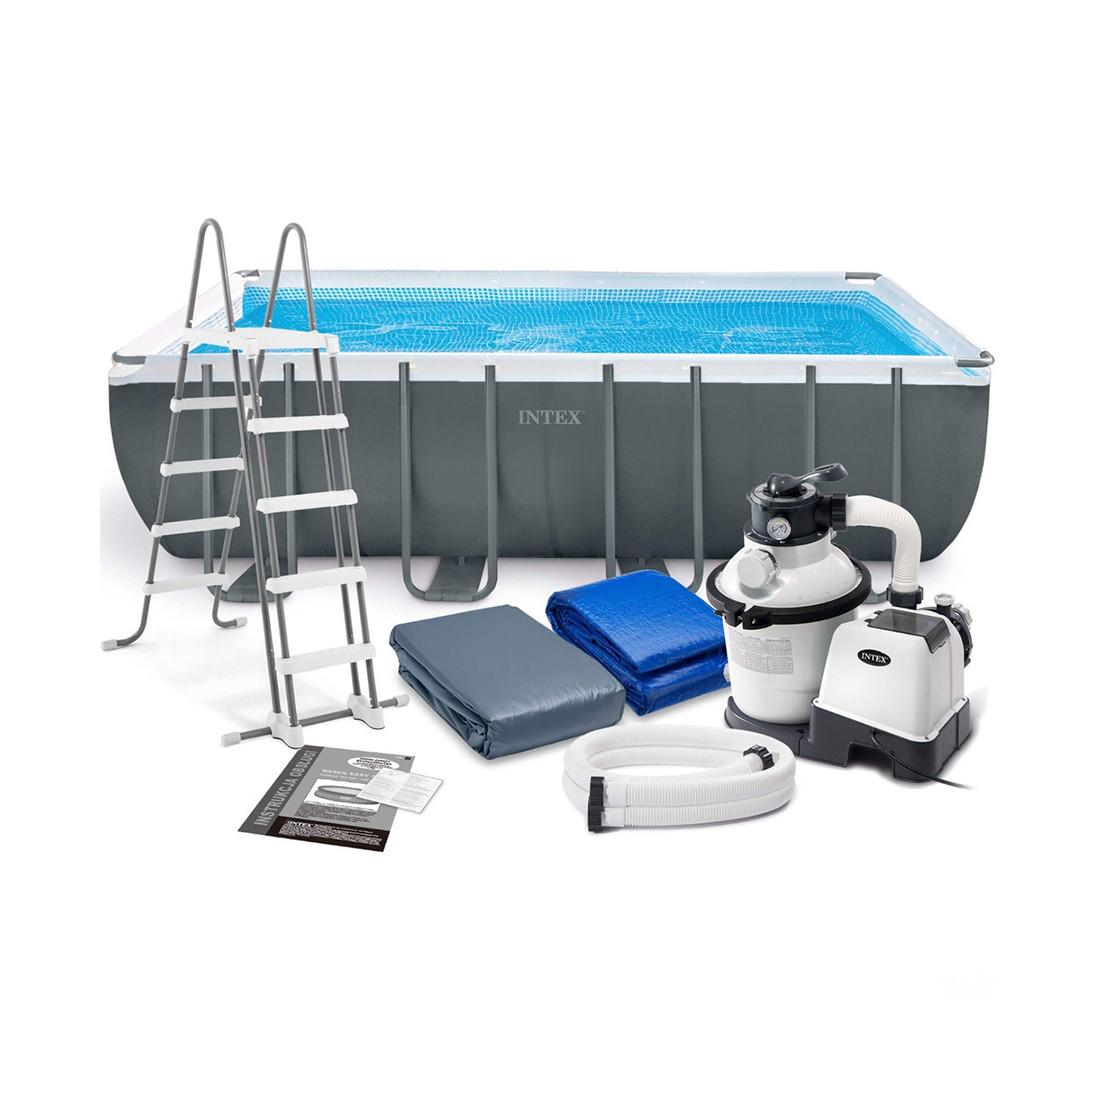 Каркасный бассейн Ultra XTR Frame 549 х 274 x 132 см, INTEX, 26356NP